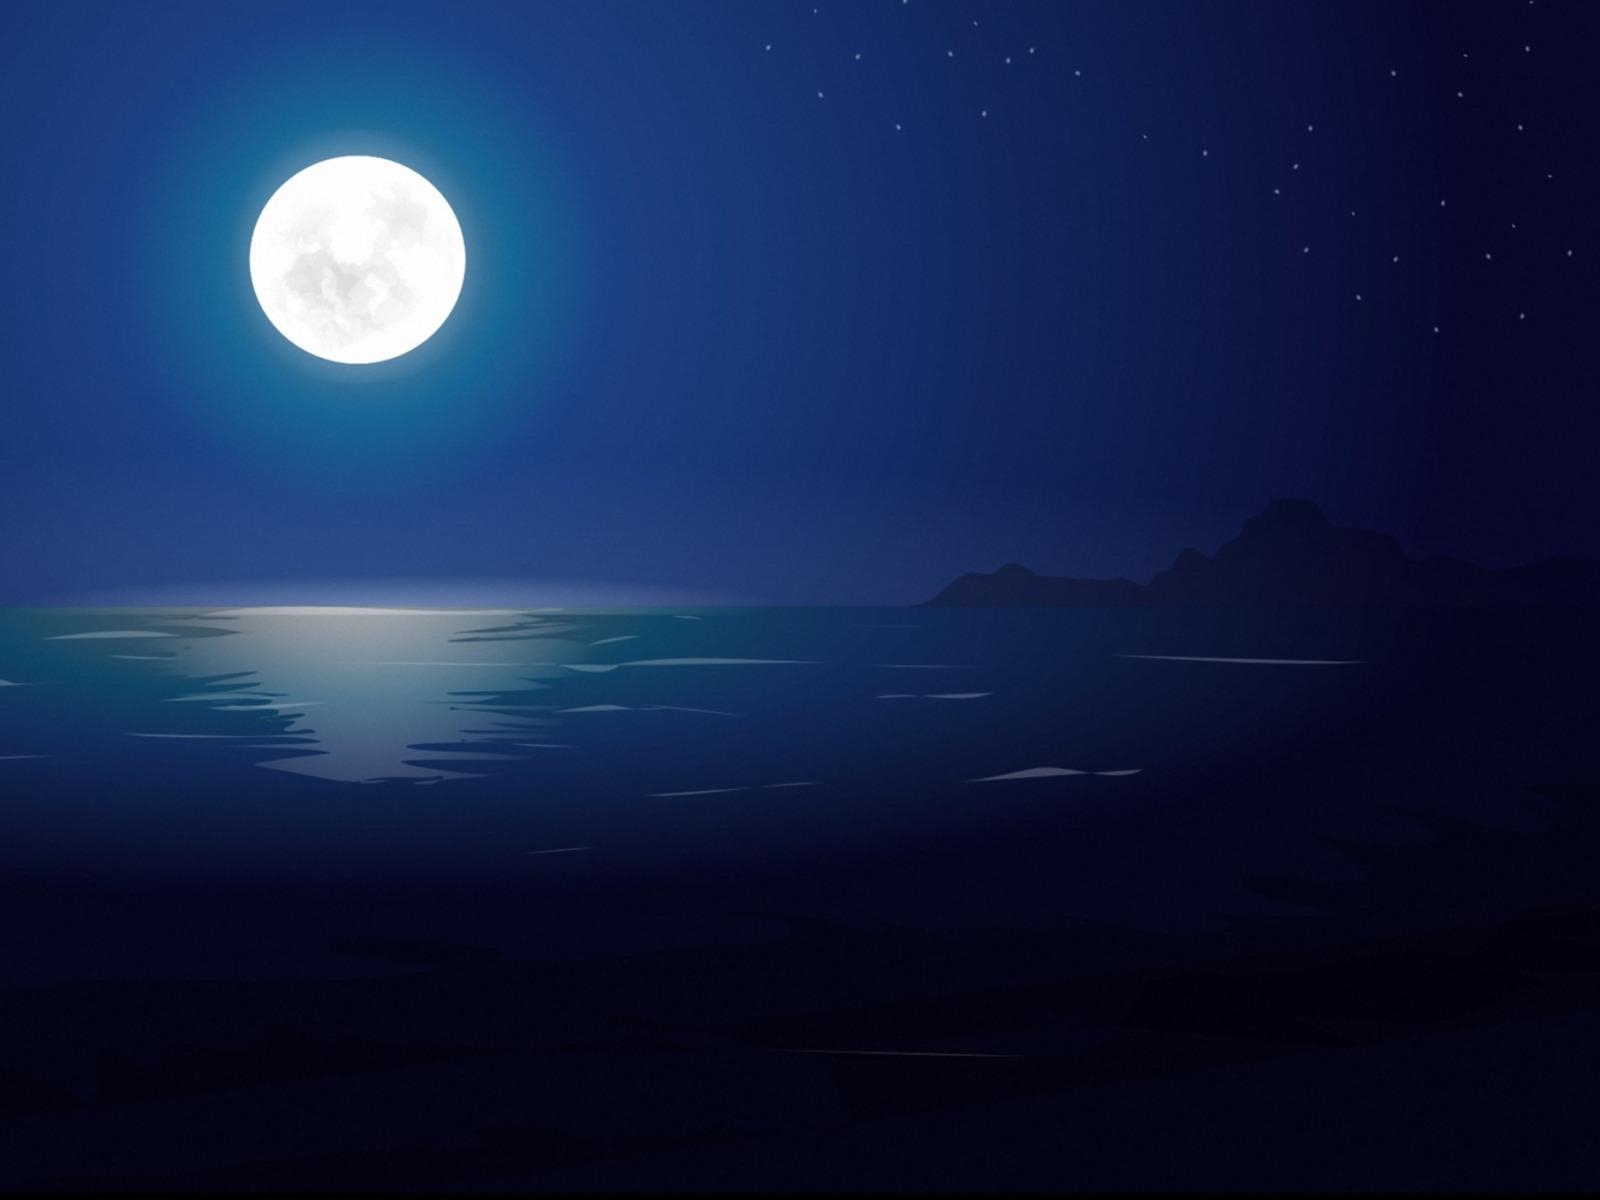 Открытка лунная ночь